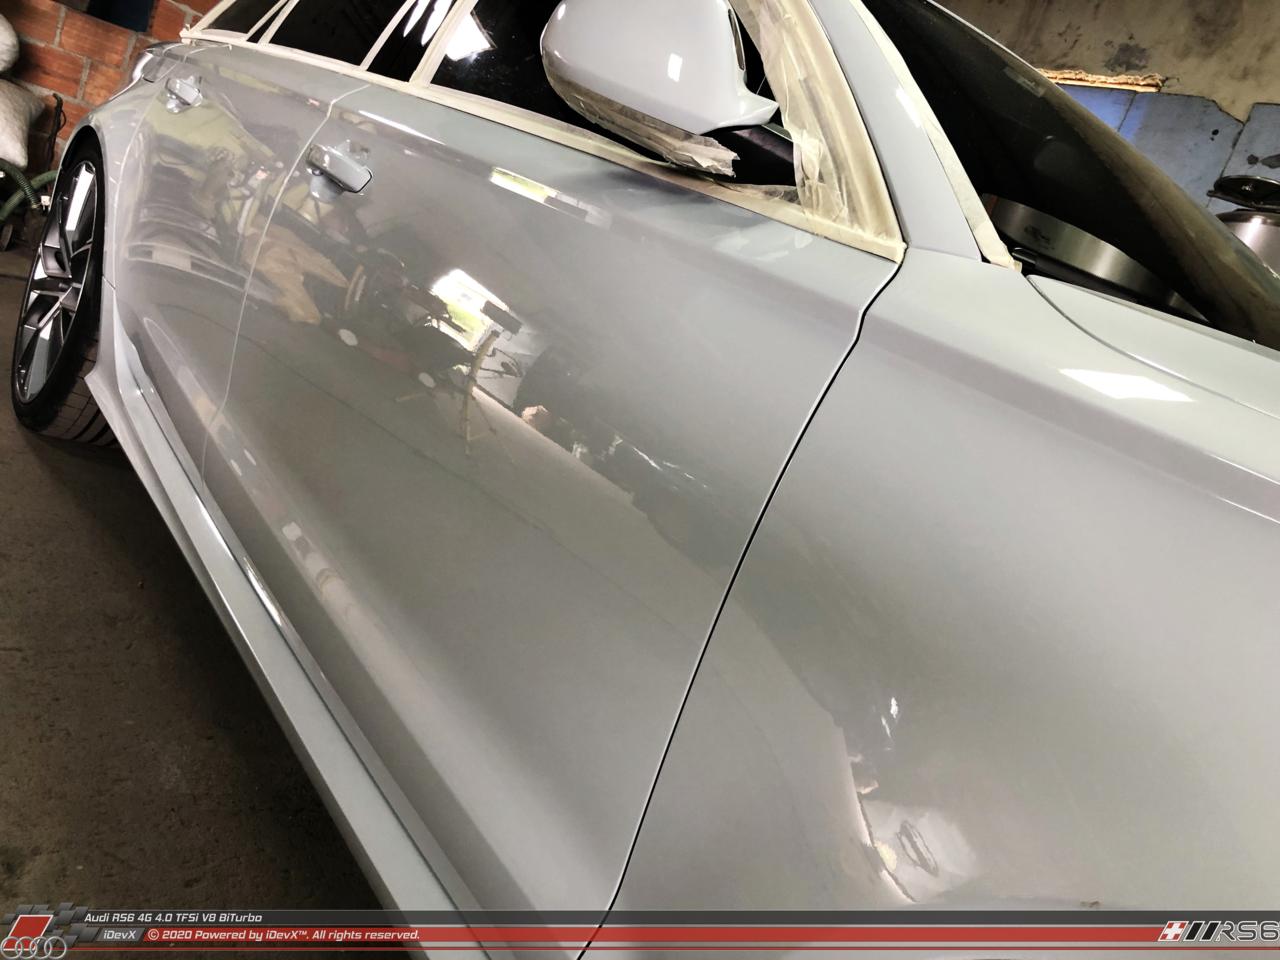 05_08.2019_Audi-RS6_iDevX_028.png